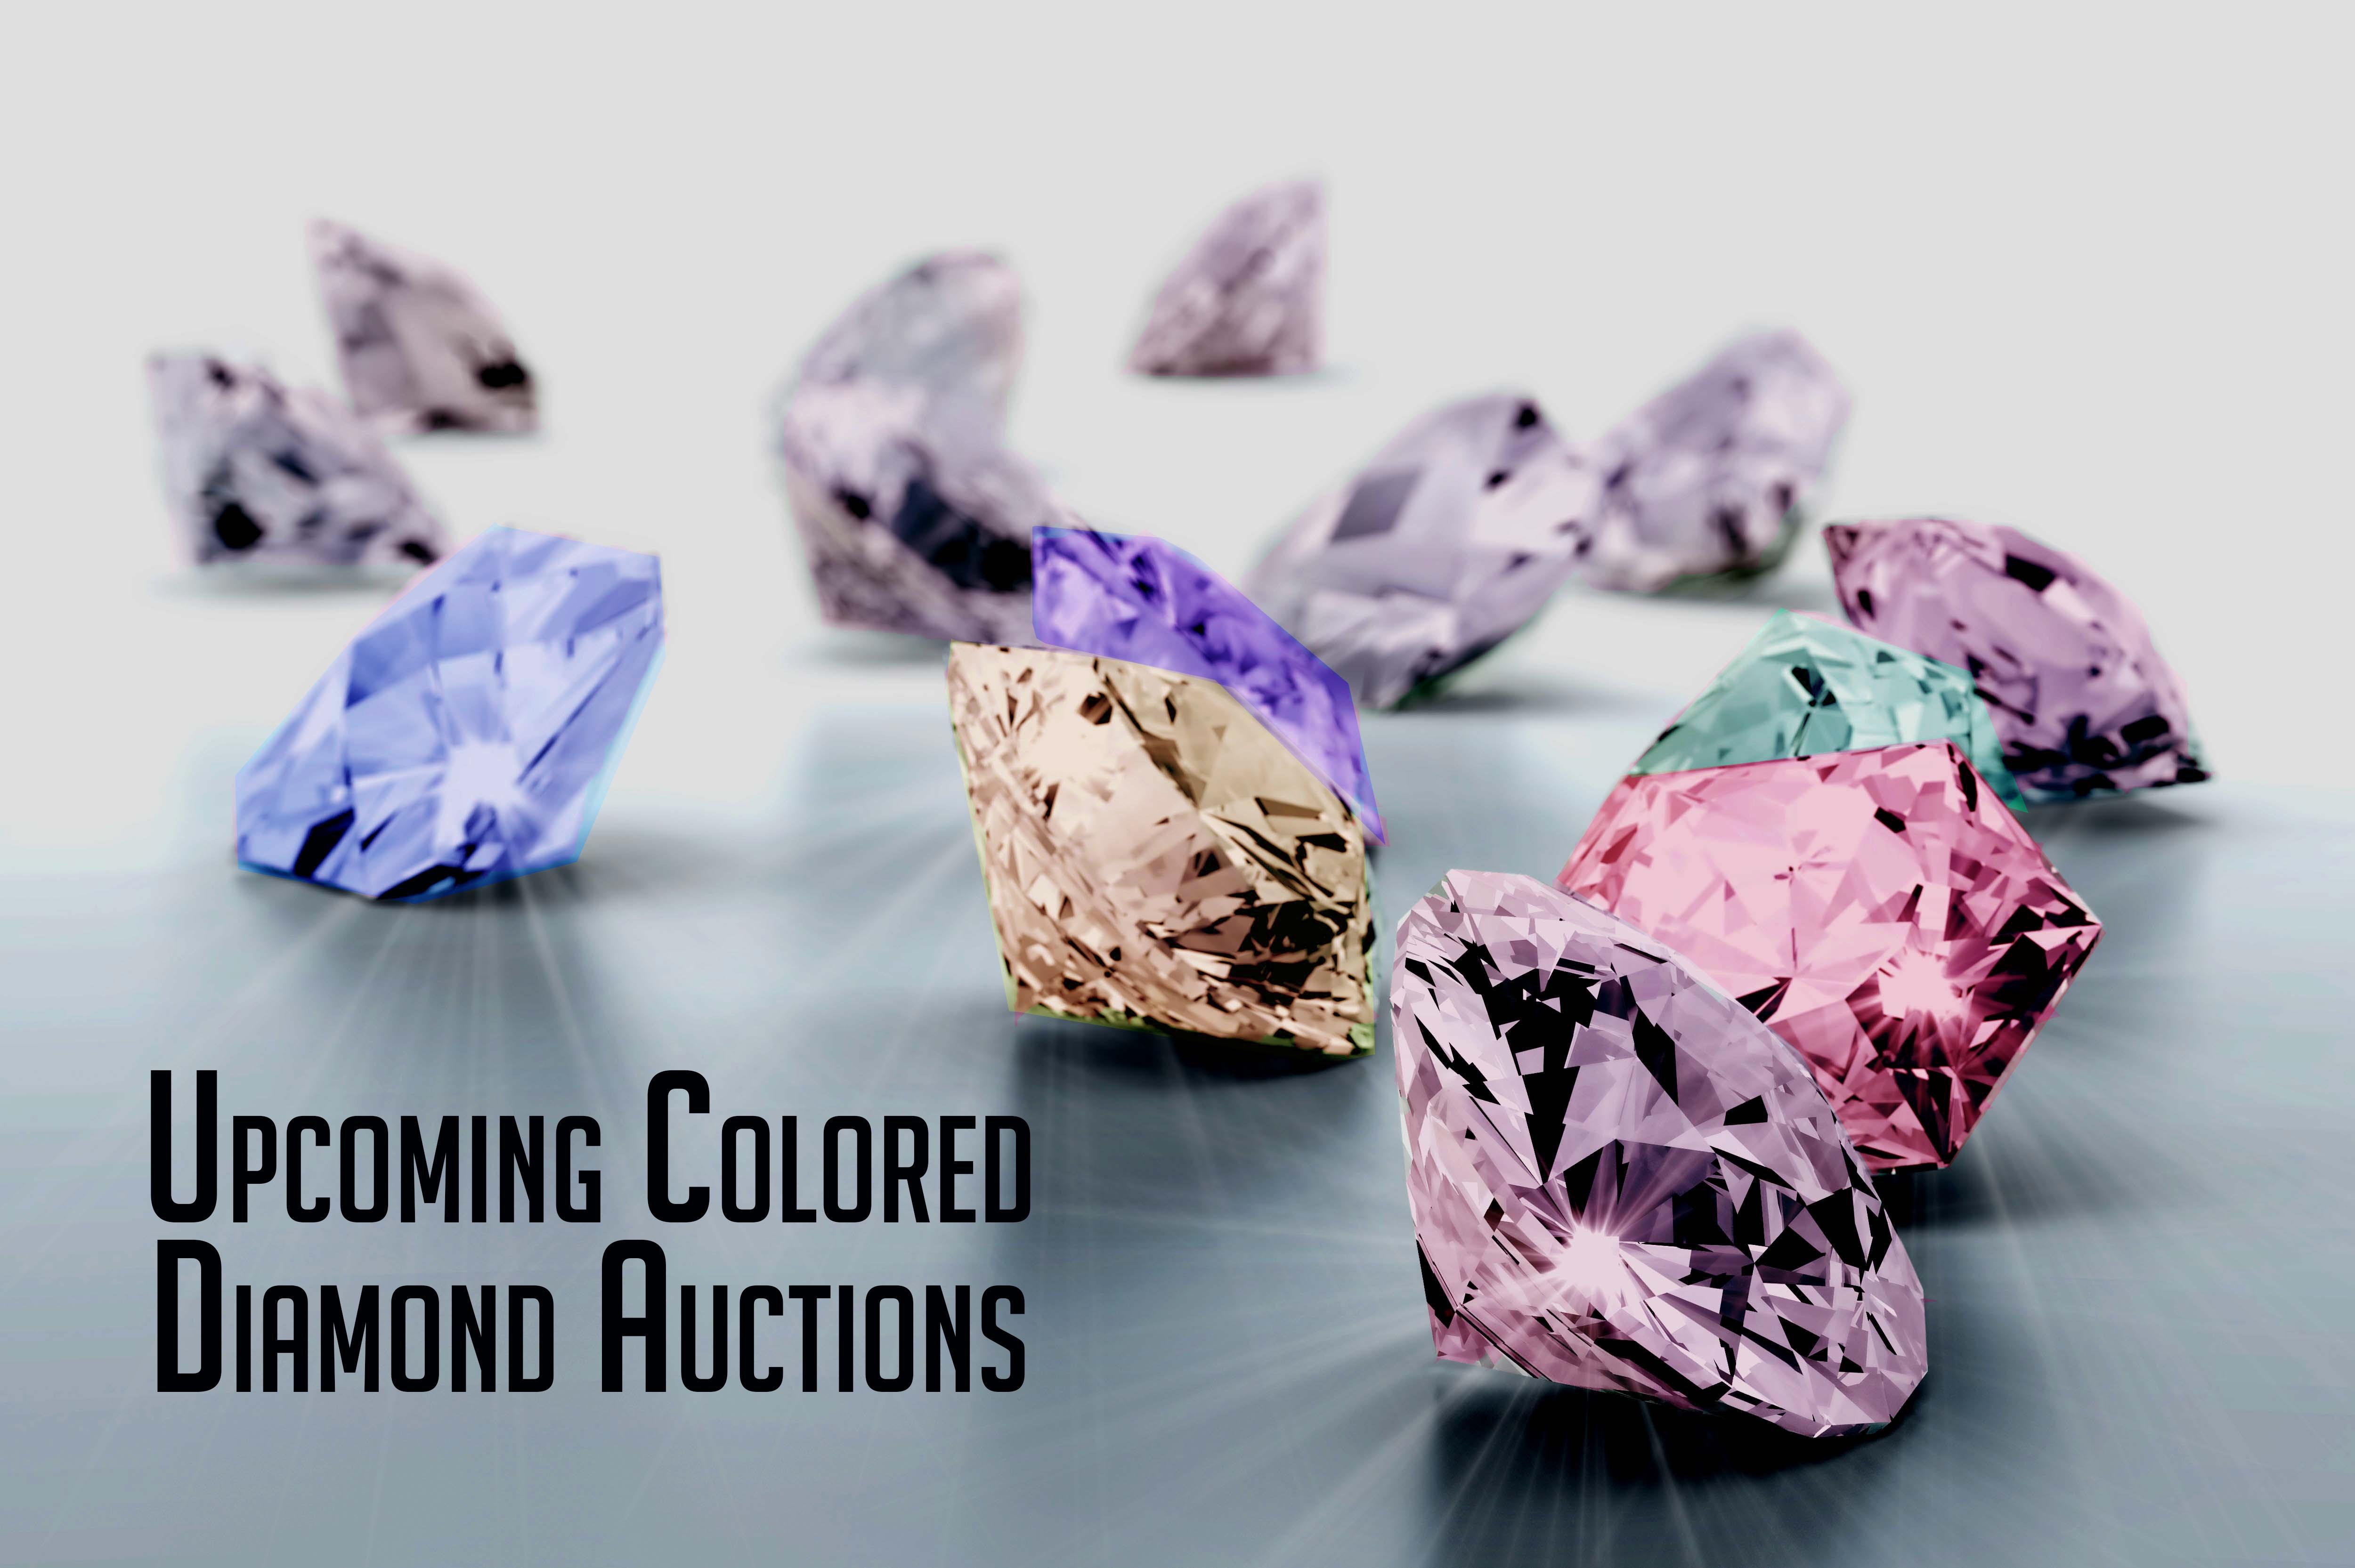 colored diamond auctions.jpg